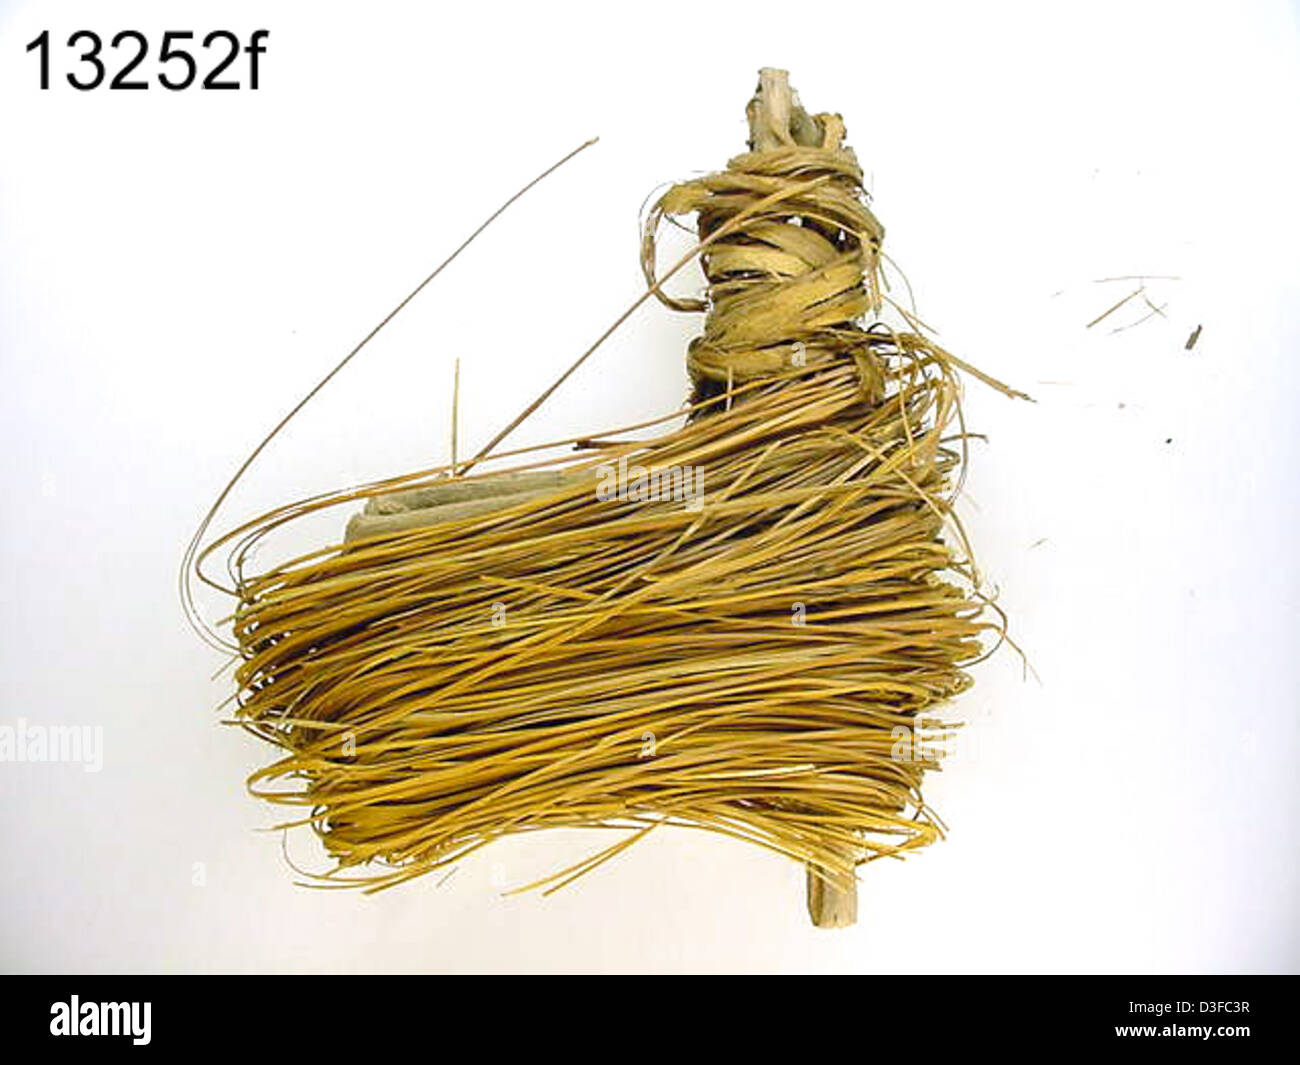 13252f Grand Canyon_Split-Twig Figurine - Stock Image